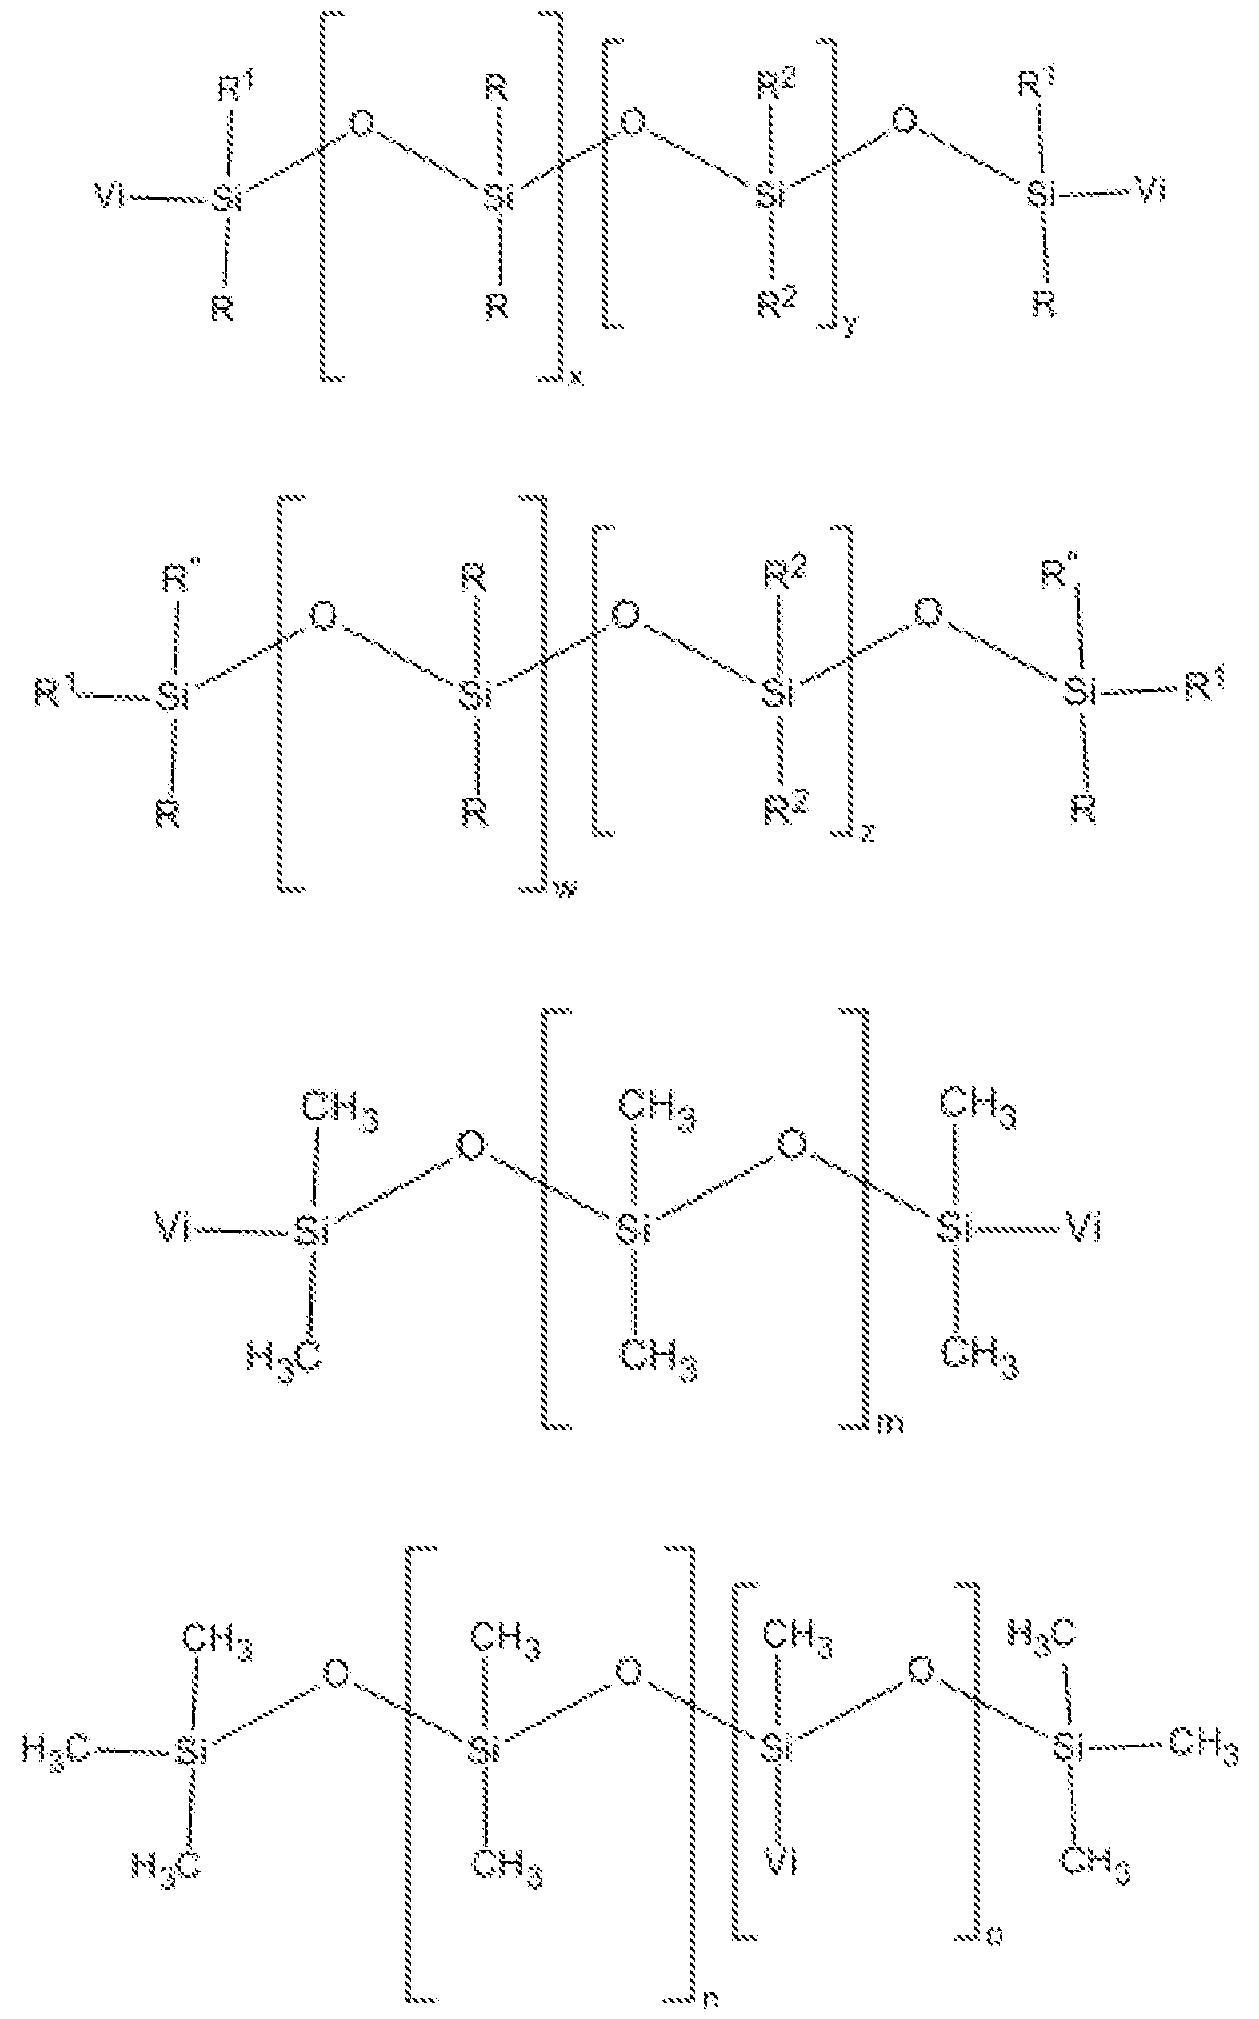 Silicone Injection Molding | Wiring Diagram Database